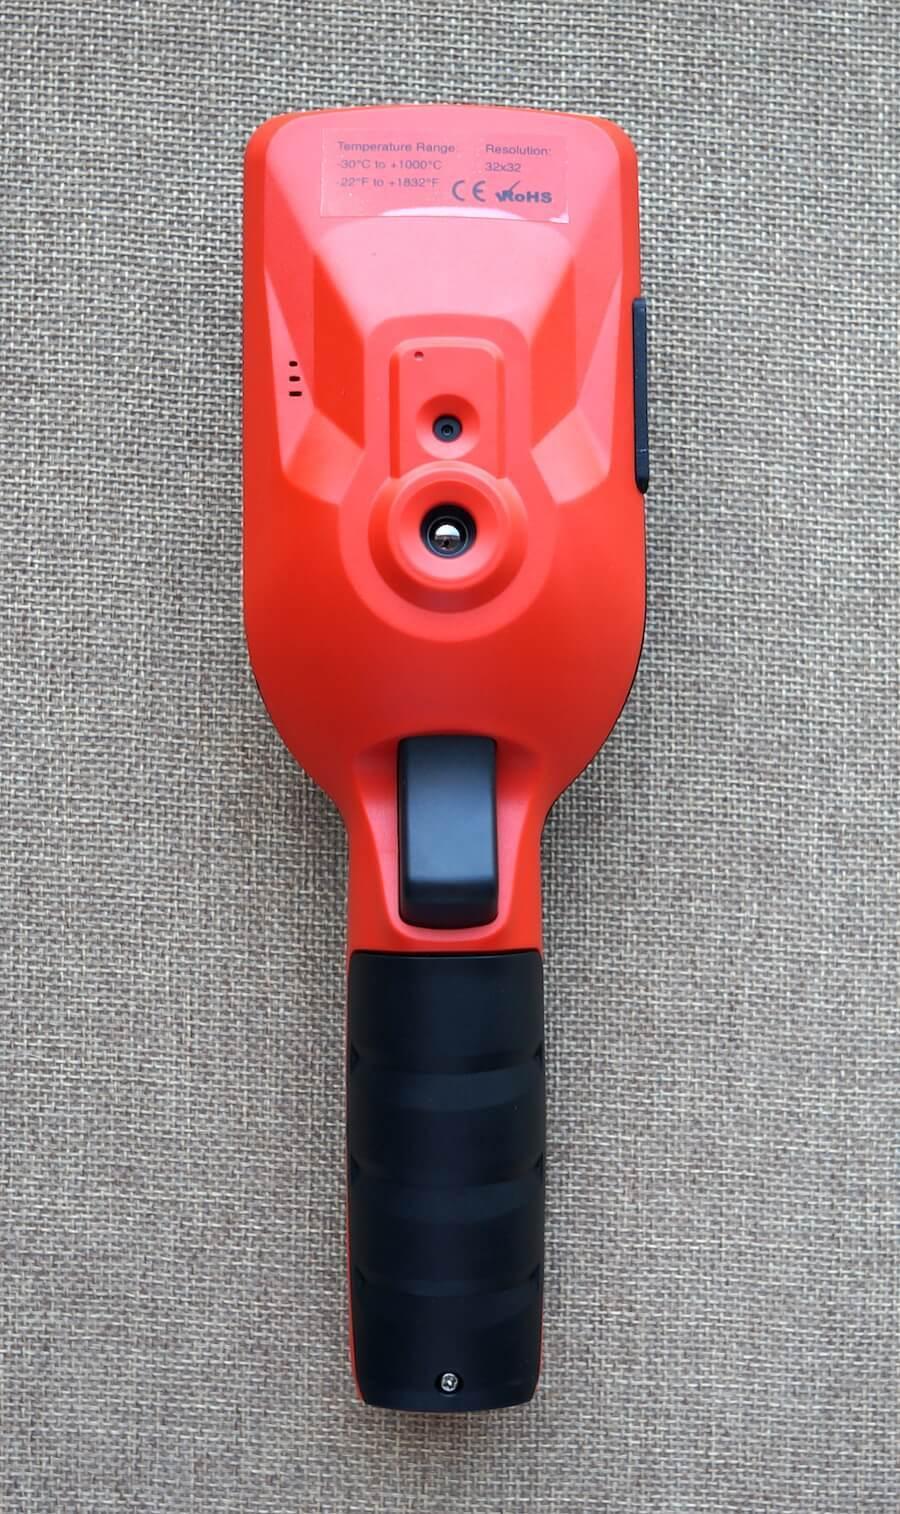 PerfectPrime IR0280 thermal sensor